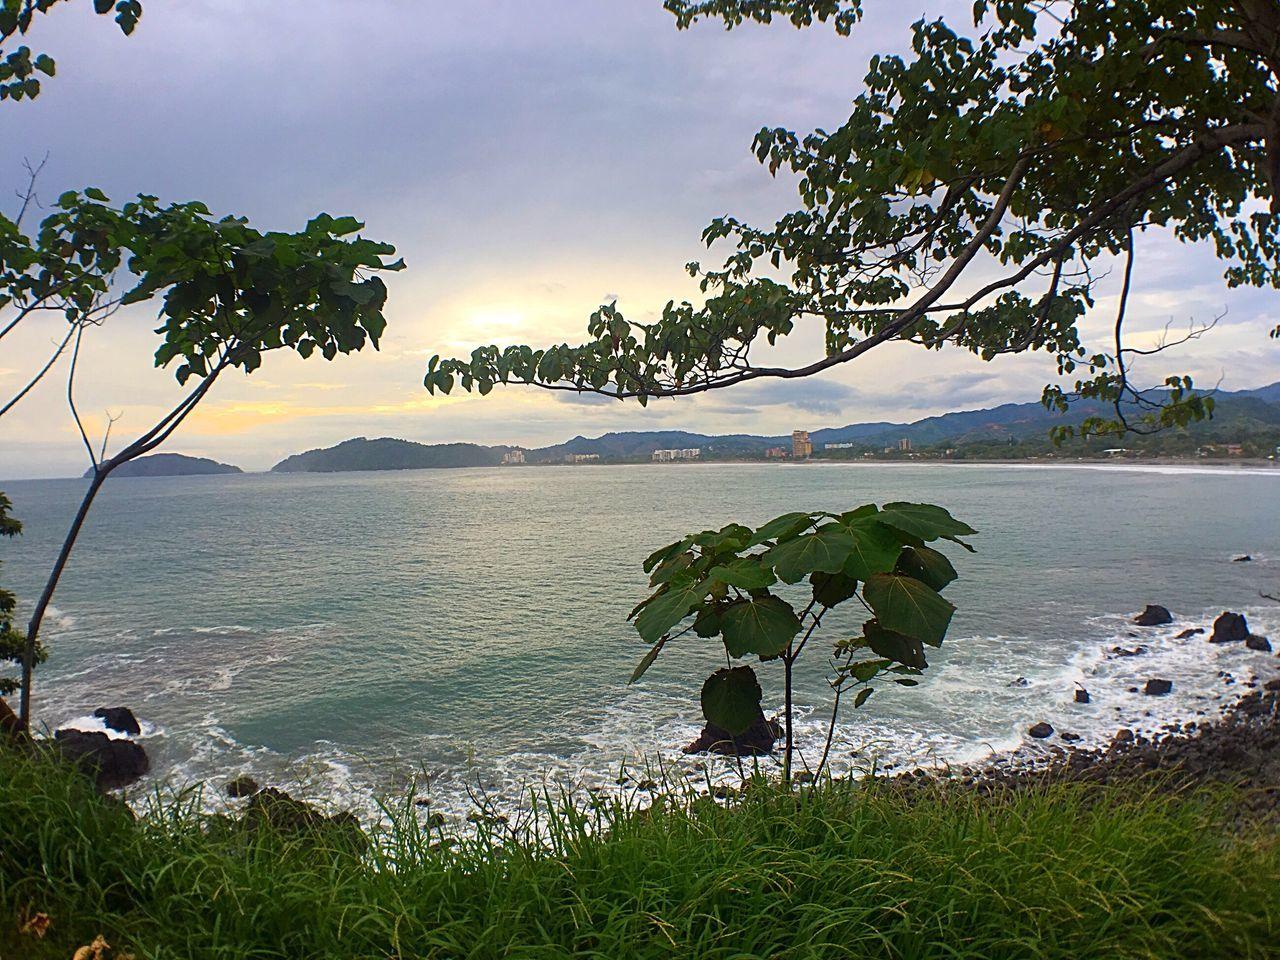 TakeoverContrast Missions Costa Rica Pura Vida ✌ Water Tranquil Scene Nature